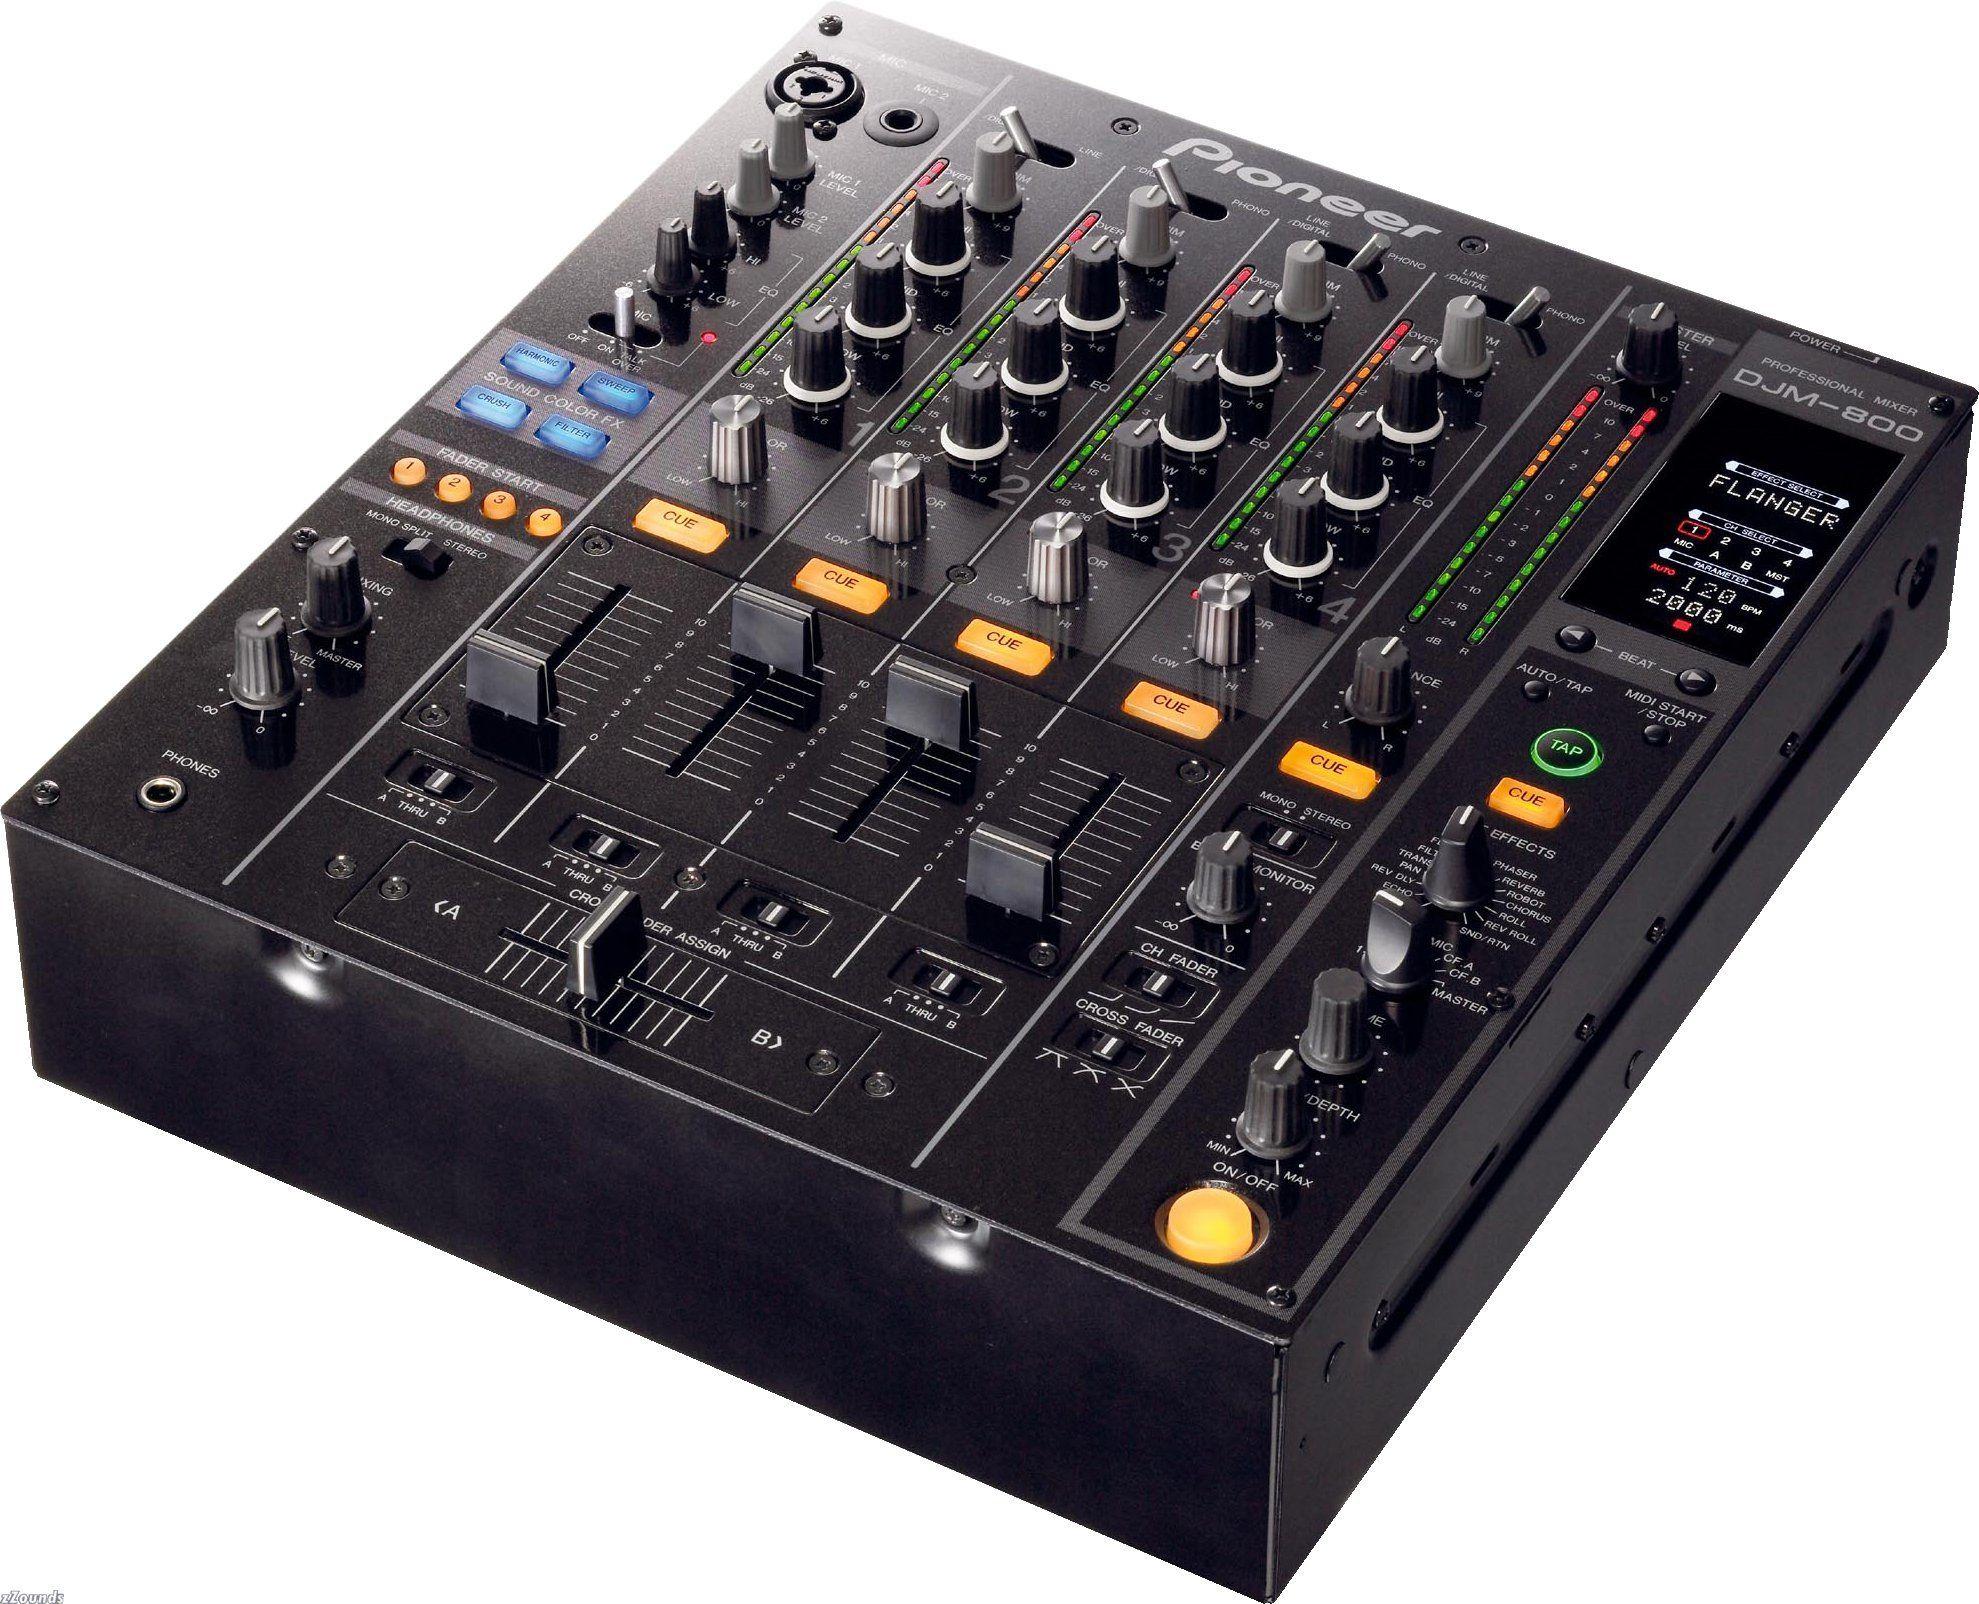 The Pioneer DJM-800 DJ mixer - DJing Tips